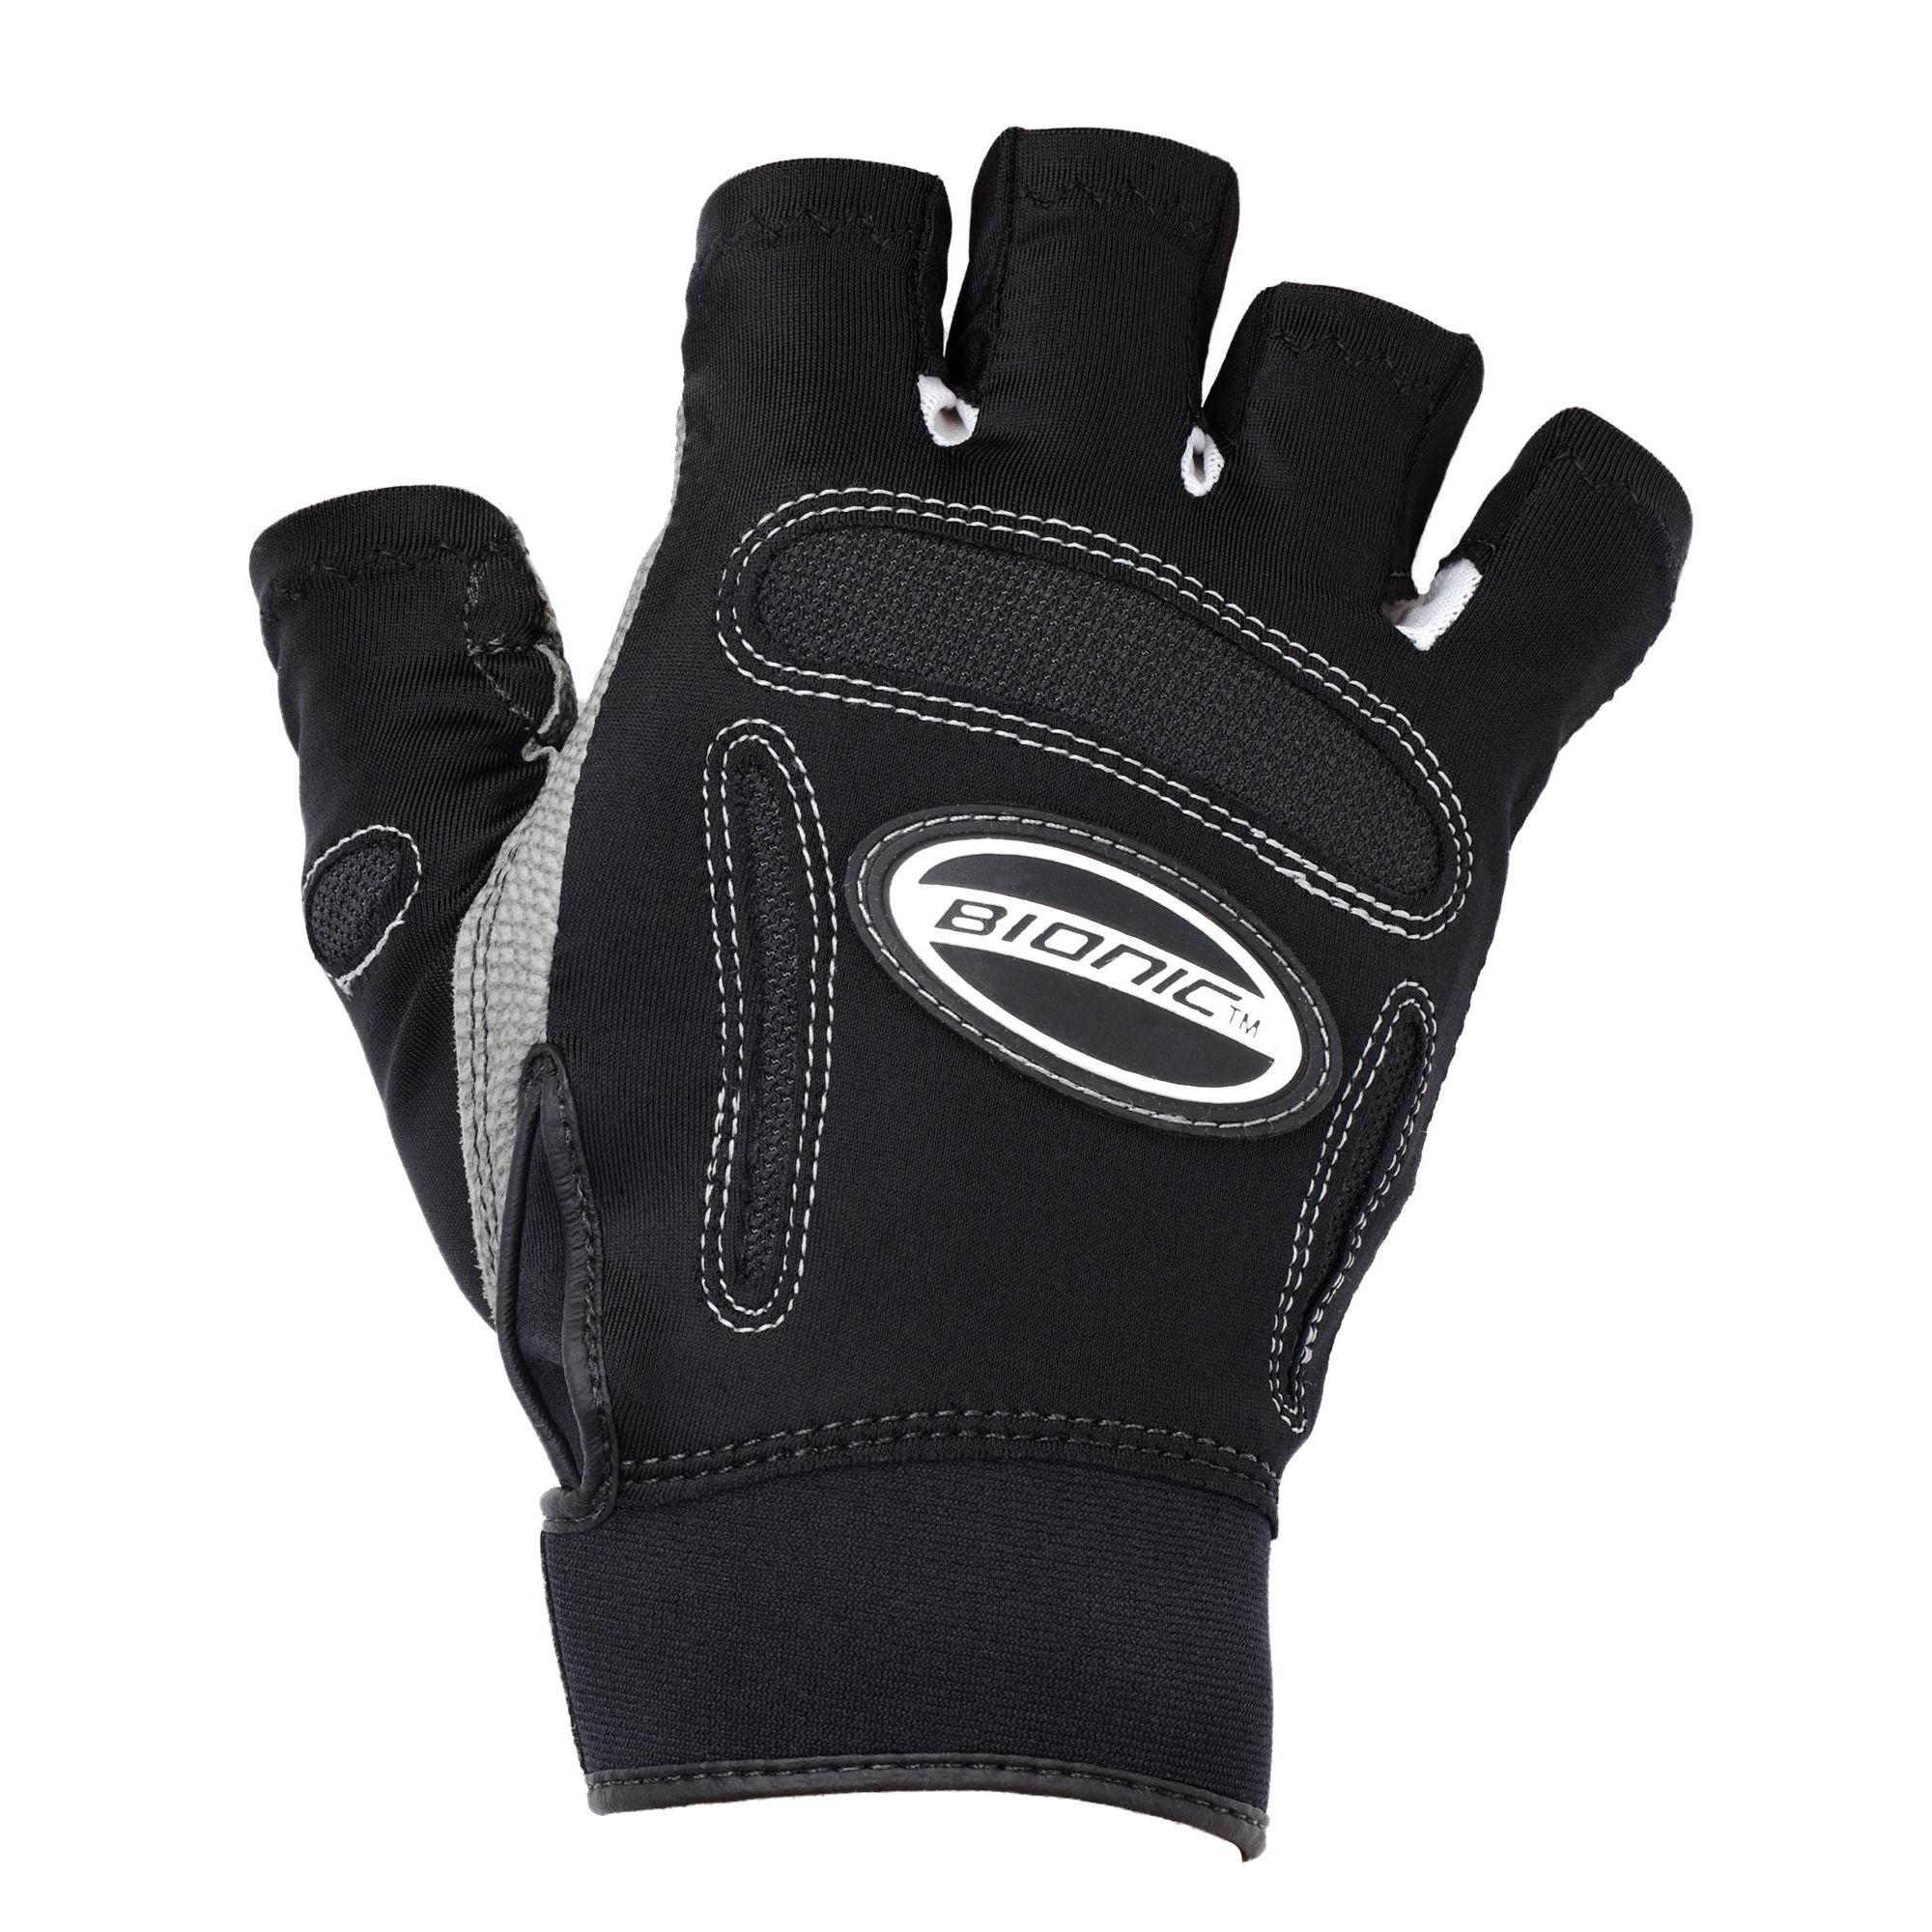 Weight Lifting Gloves Xxl: Myshop